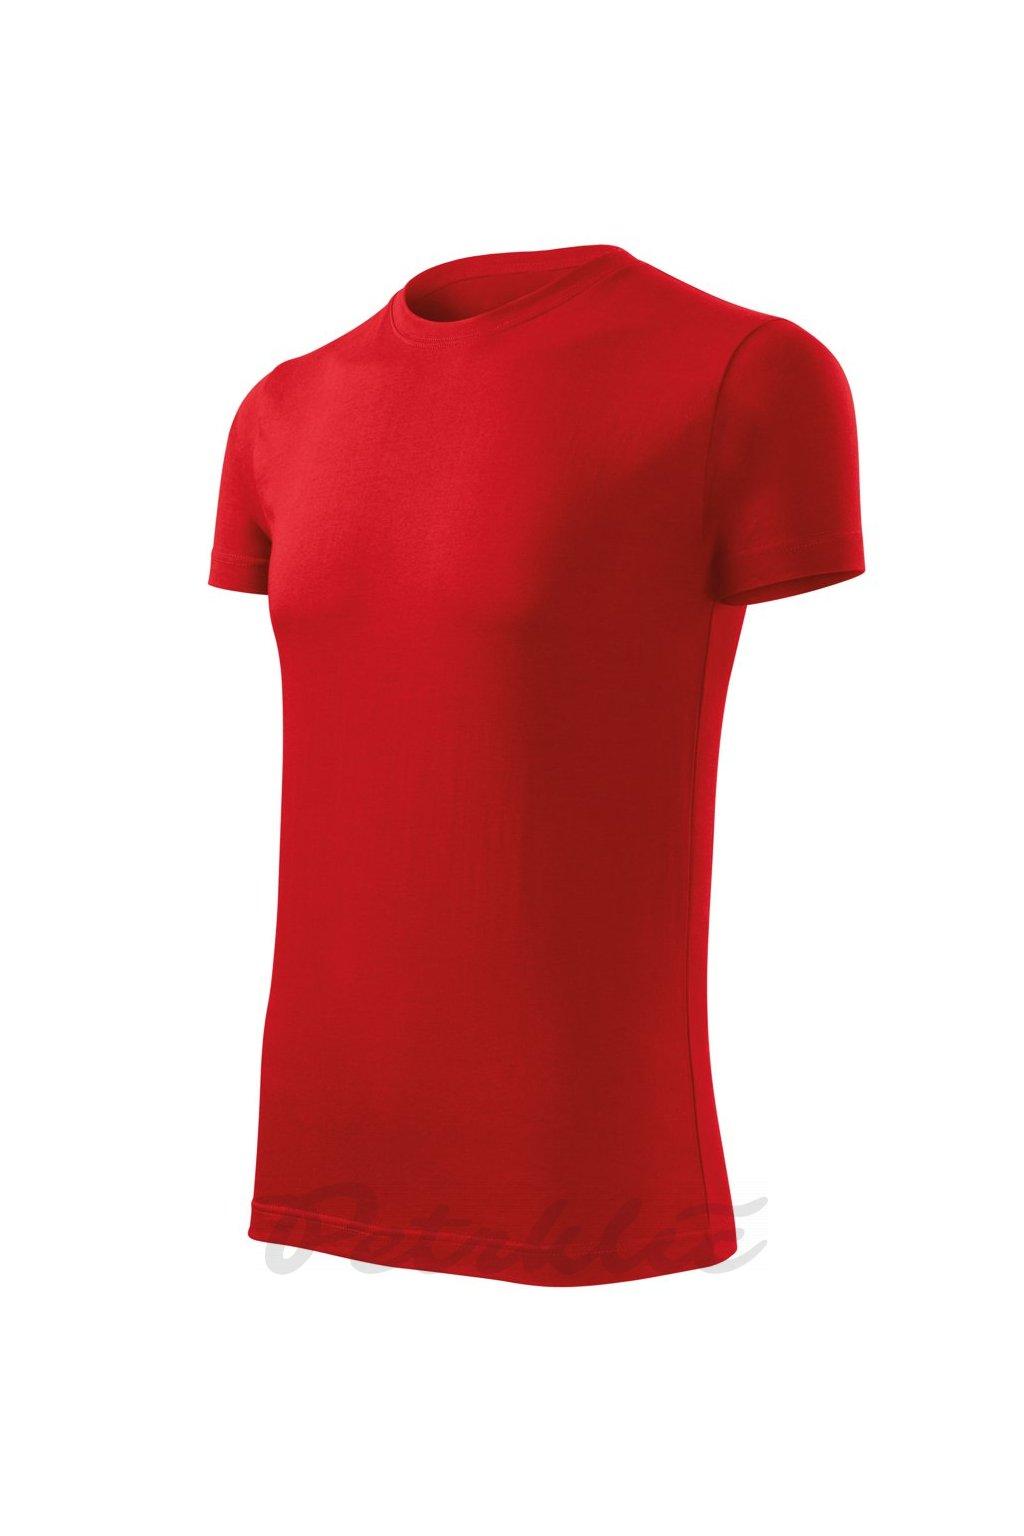 pánské tričko viper free červené